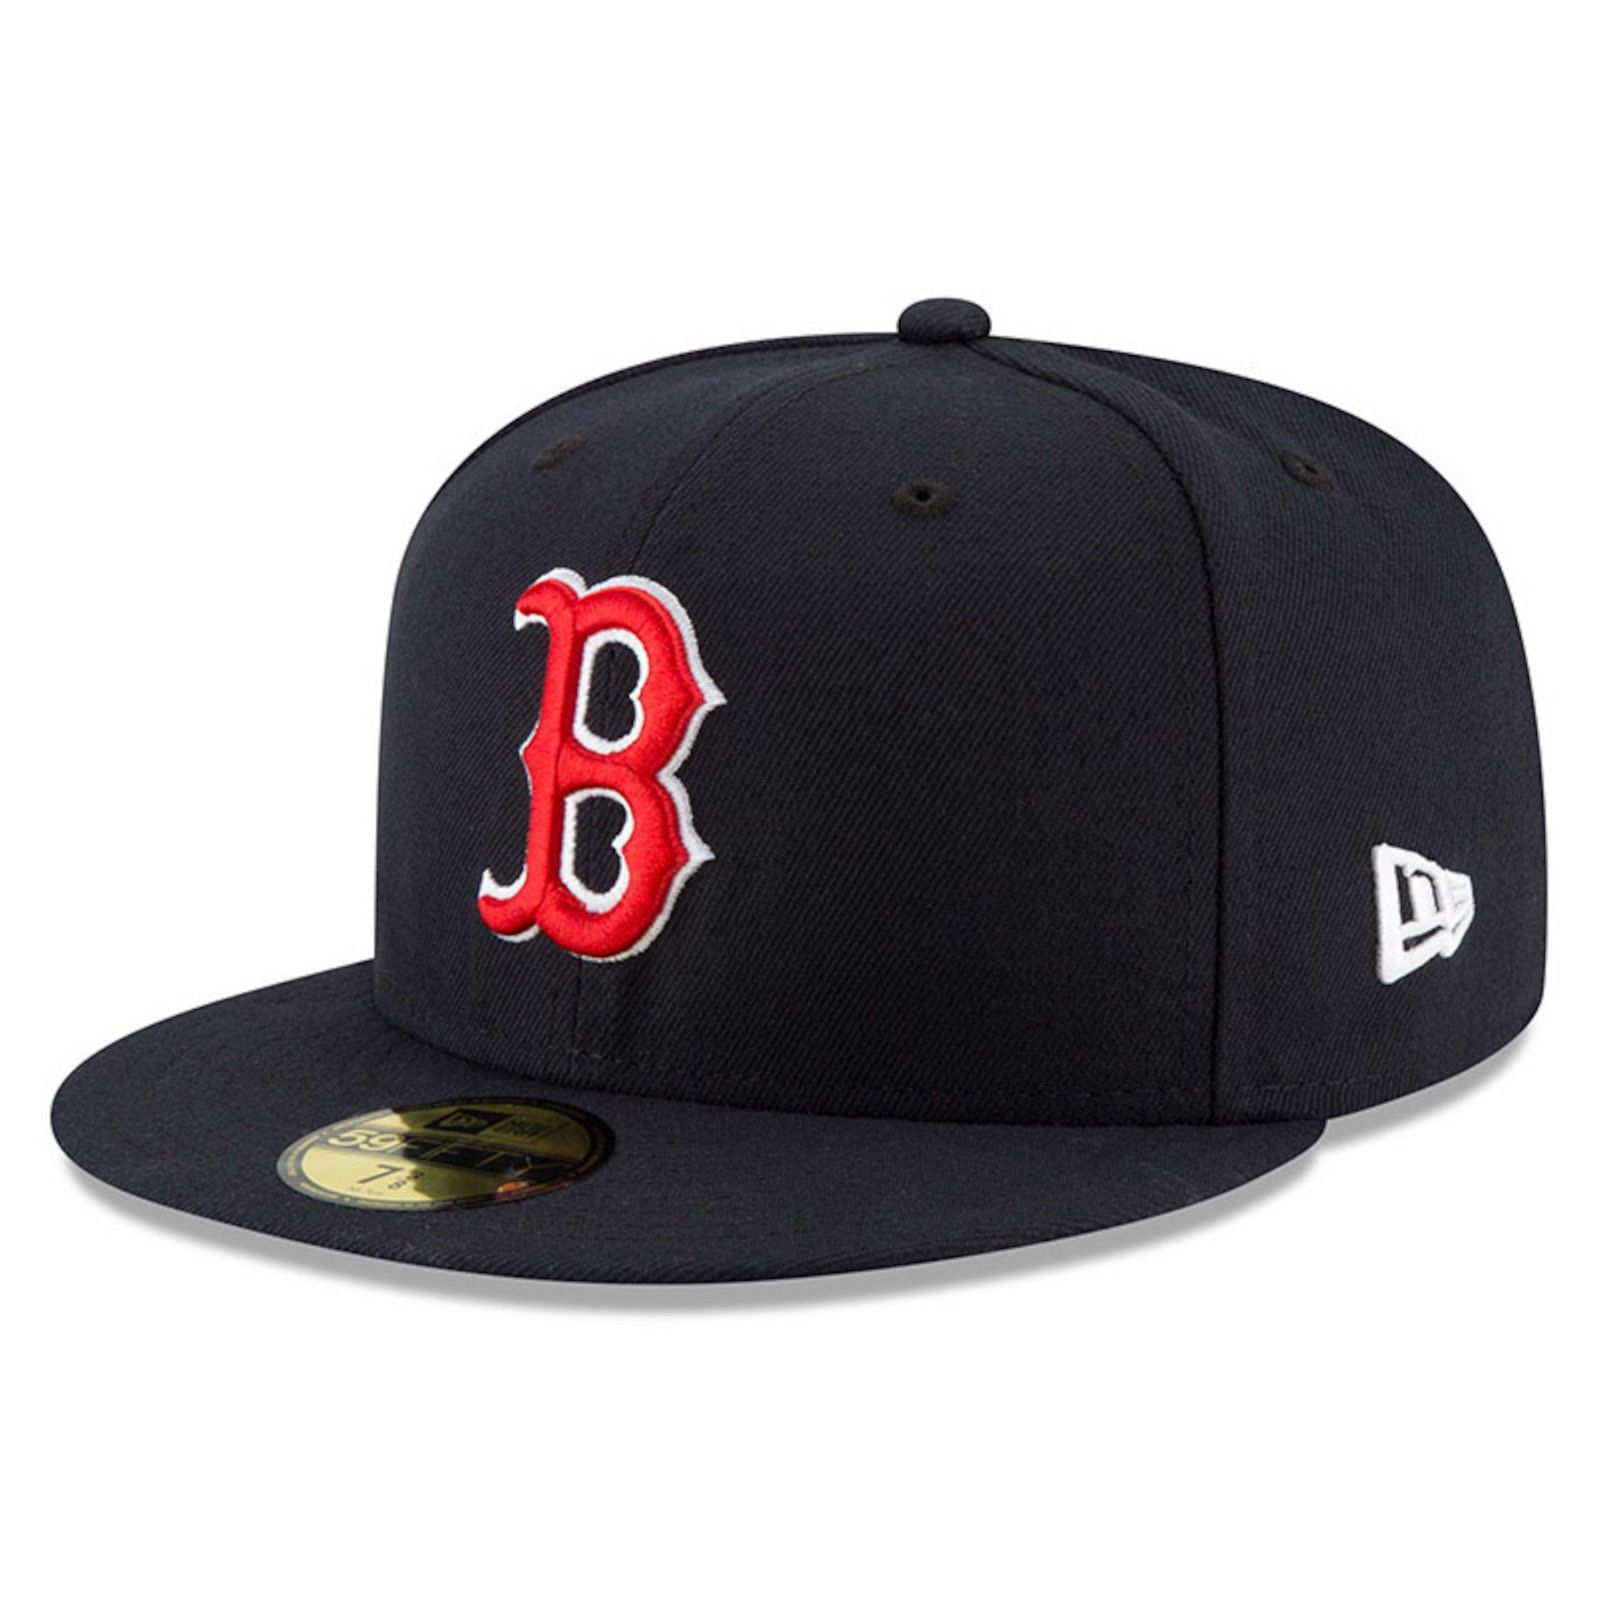 2018 boston red sox new era 59fifty mlb world series on